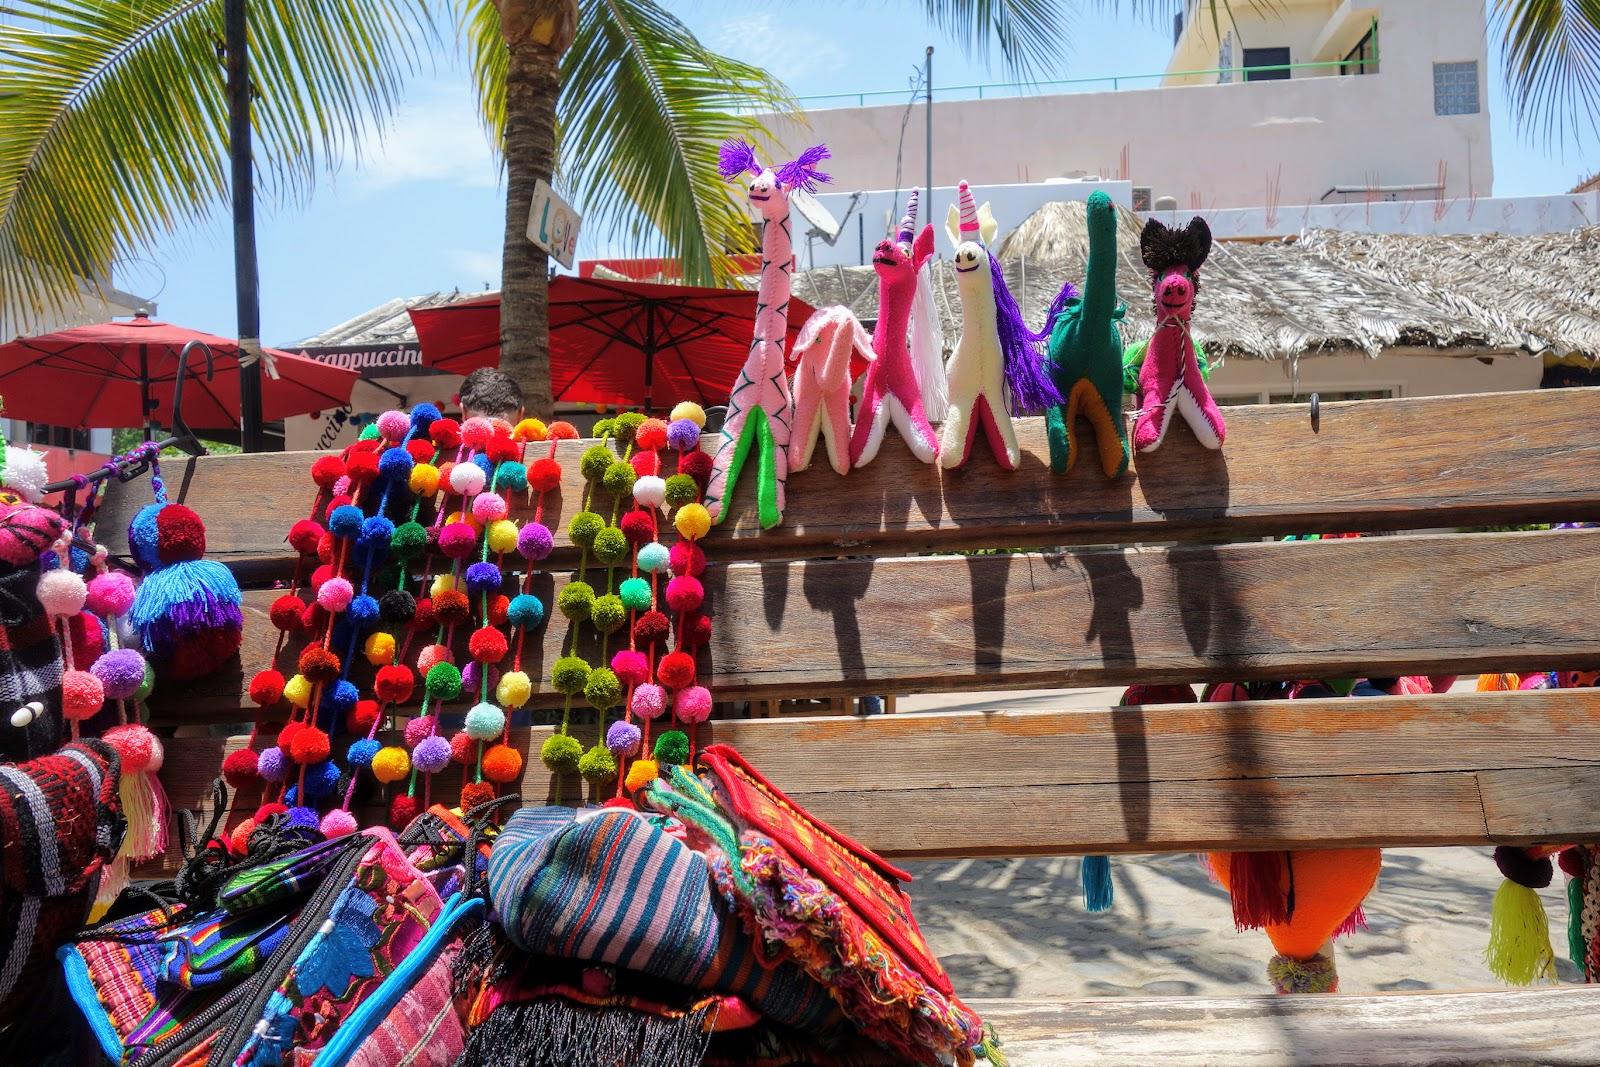 Travel, Sayulita, Pueblo Magico, Visit Mexico, Featured, Hippie Town, Nayarit, Bachelorette trip ideas,